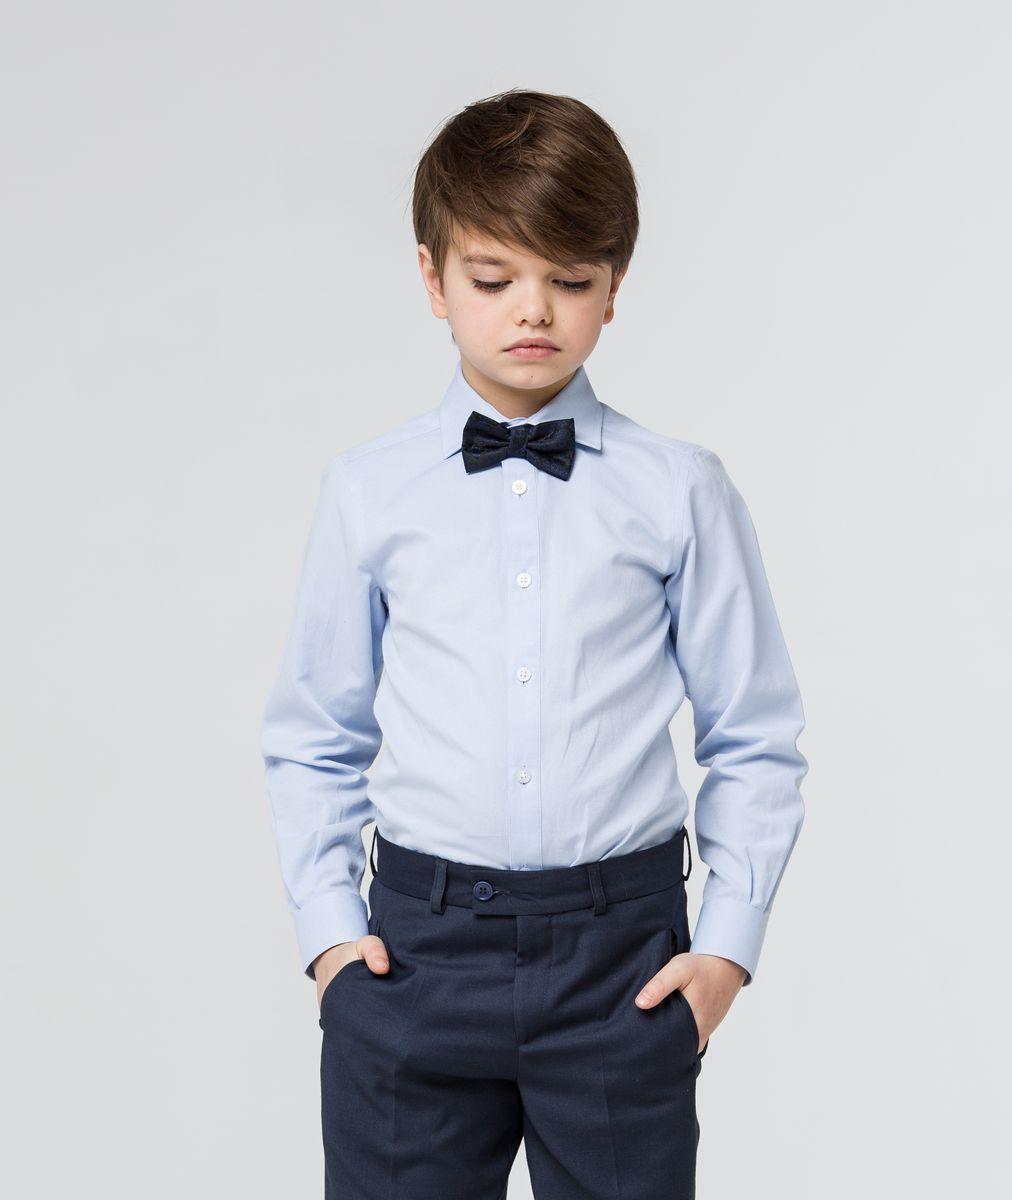 Рубашка для мальчика. SSFSB-629-13831-331SSFSB-629-13831-331